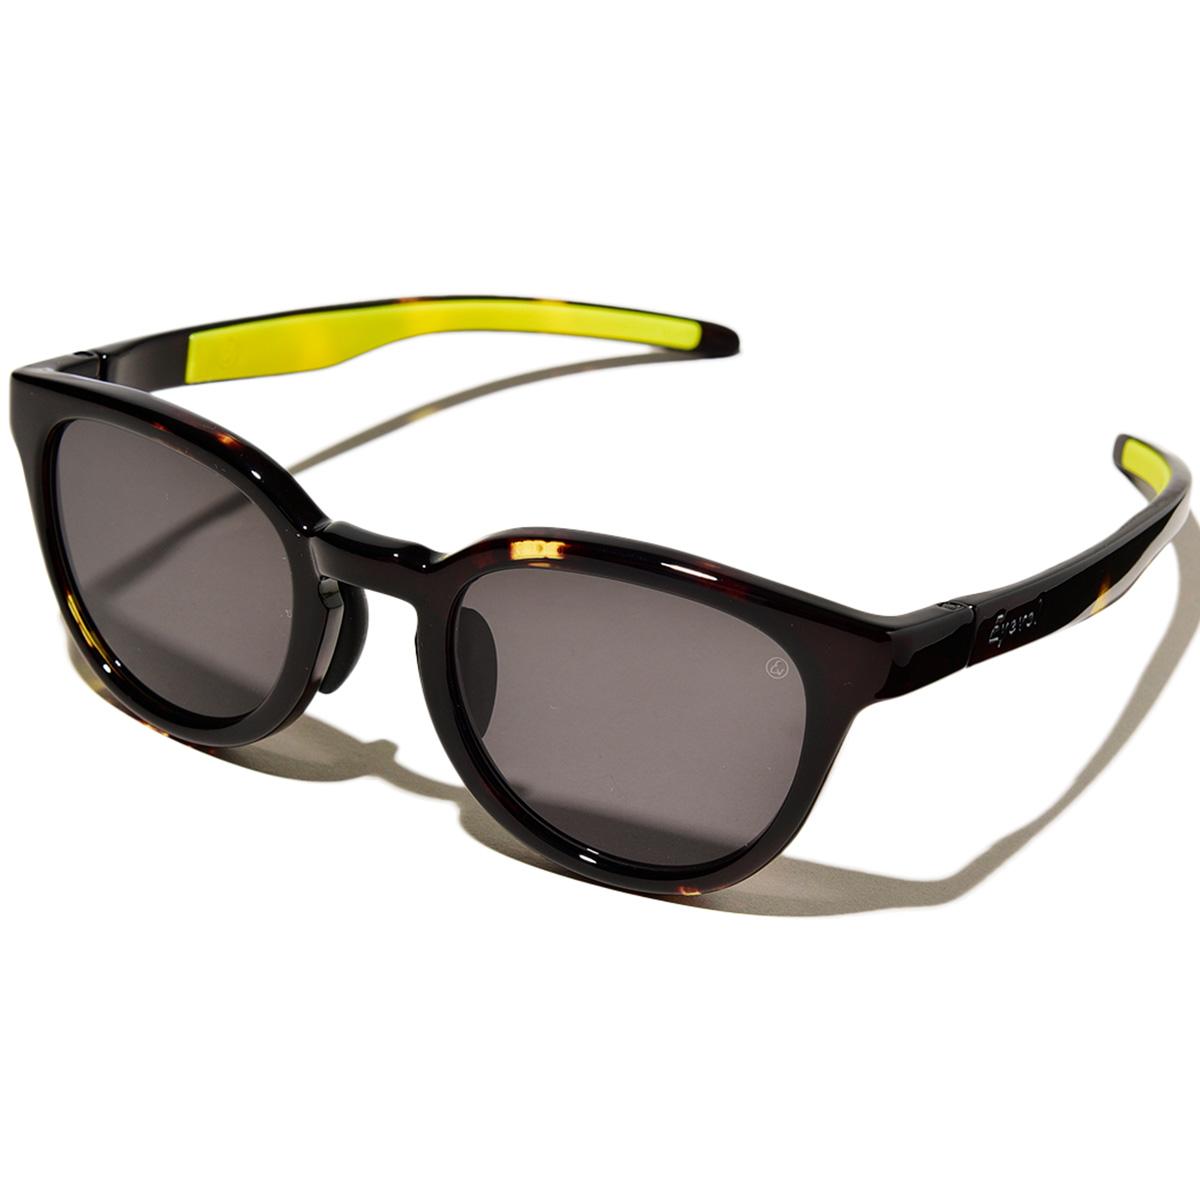 LEIFER 2 XL 49 偏光レンズサングラス